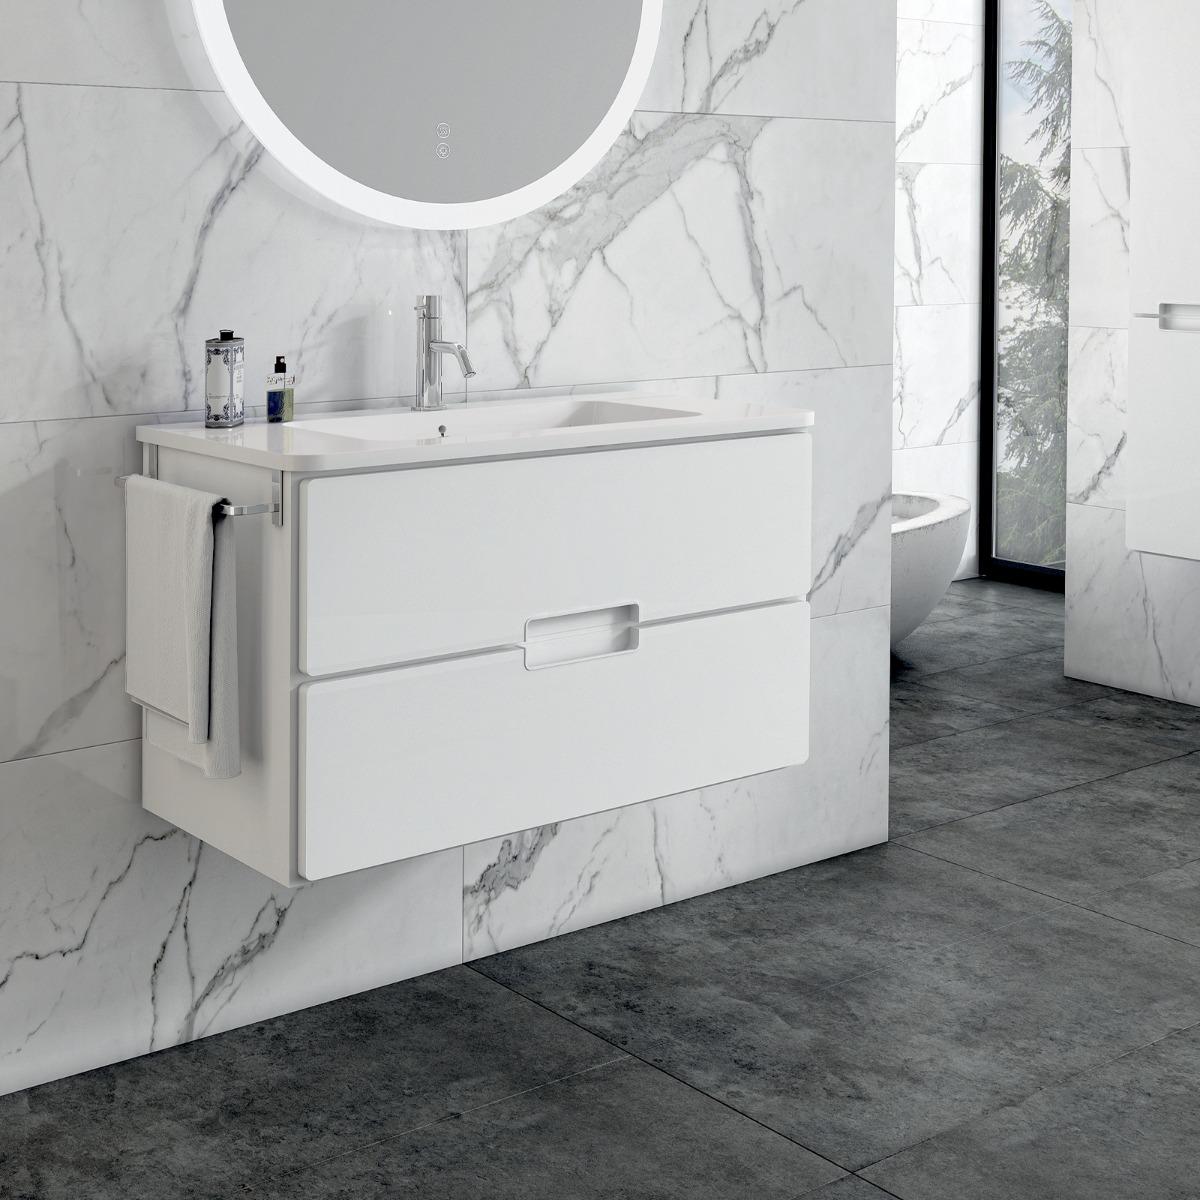 Adele 60cm Basin Set - 60cm Basin & 2 Drawer Basin Unit in White